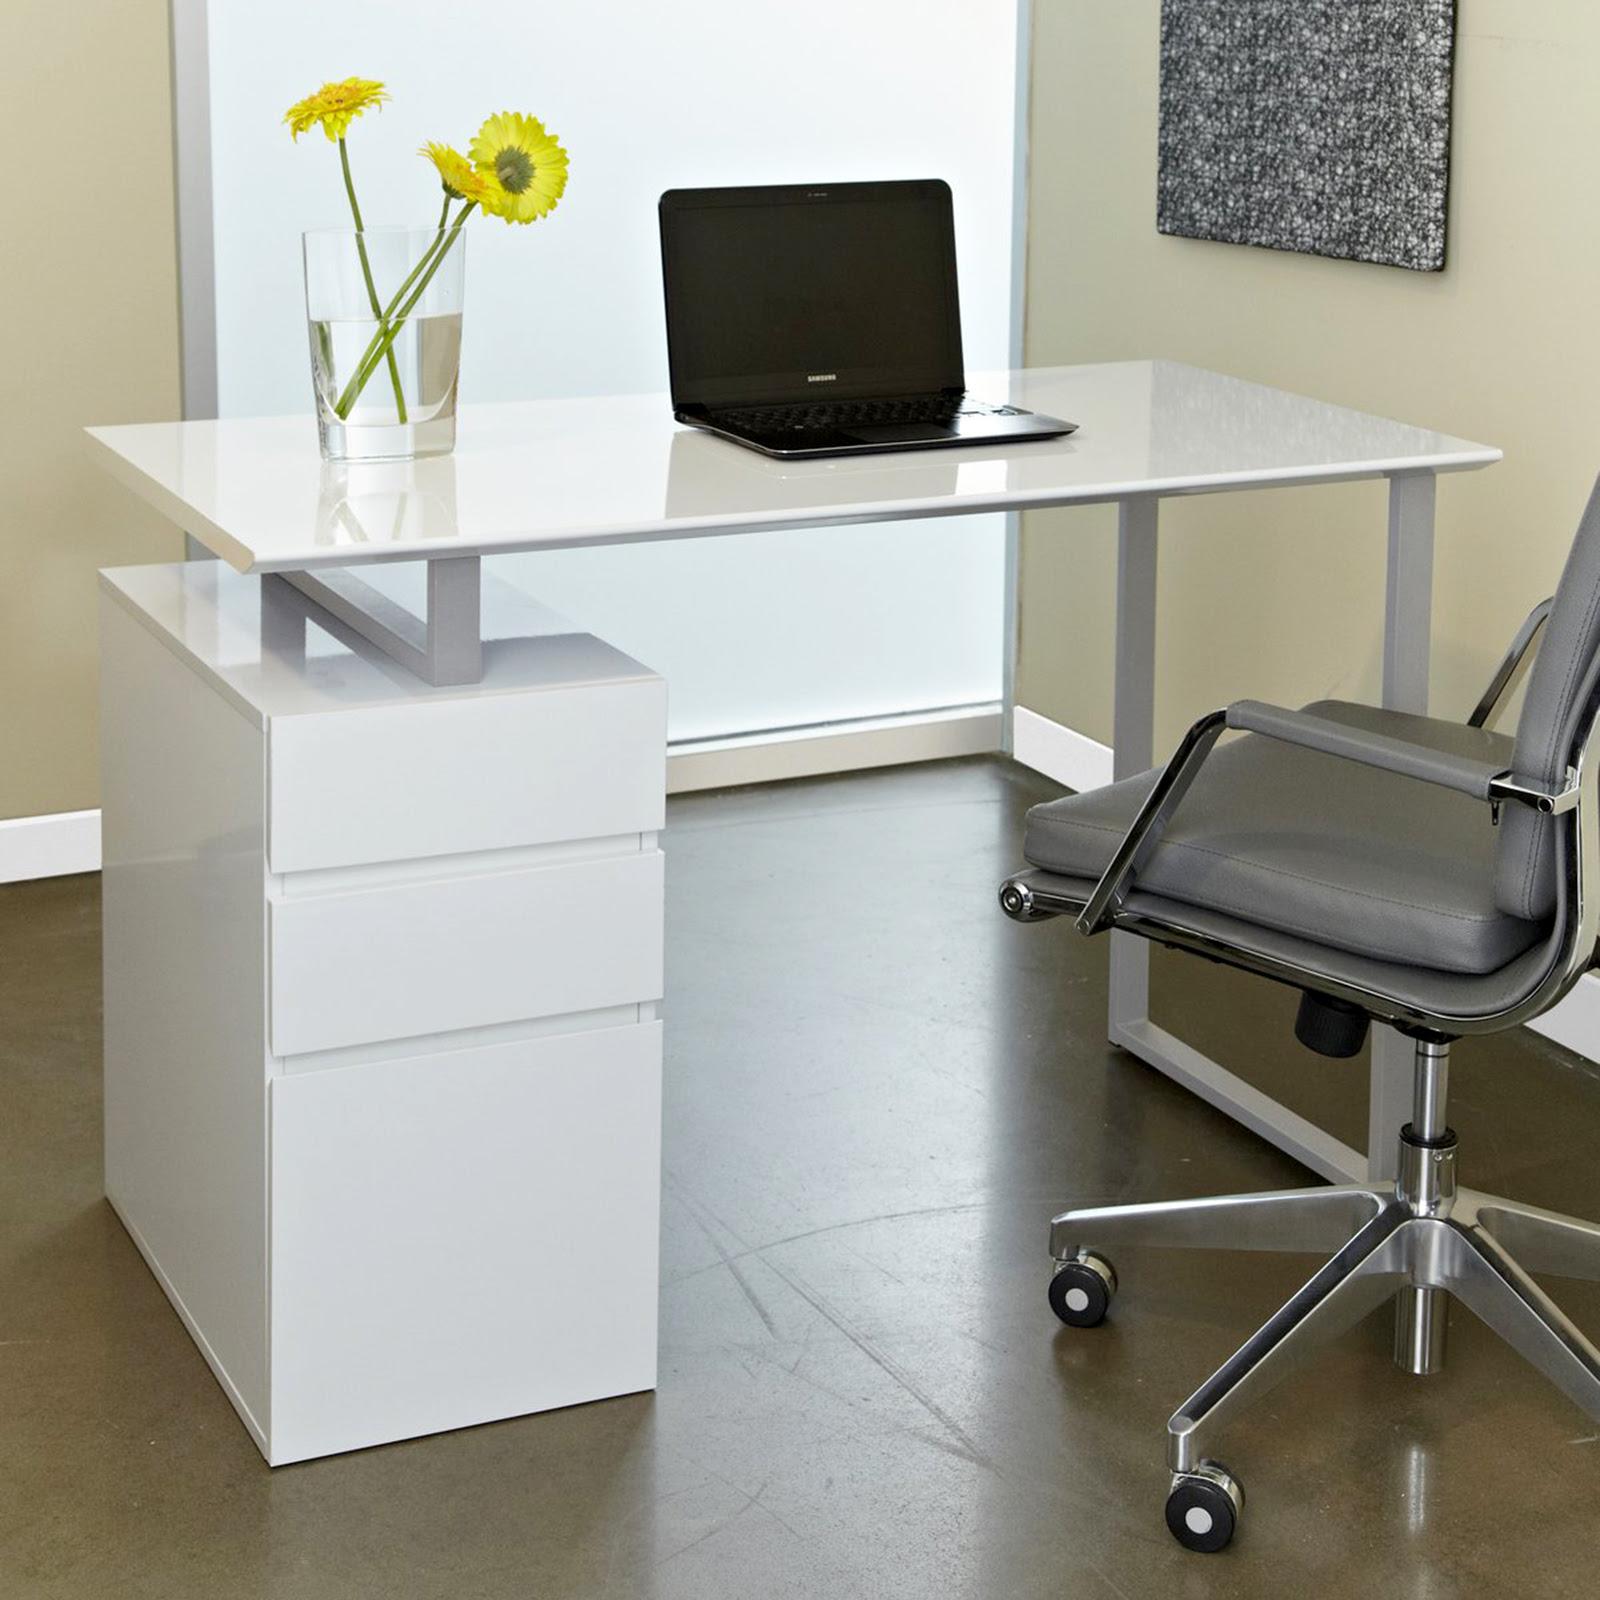 Tribeca Study Desk with Drawers - Desks at Hayneedle